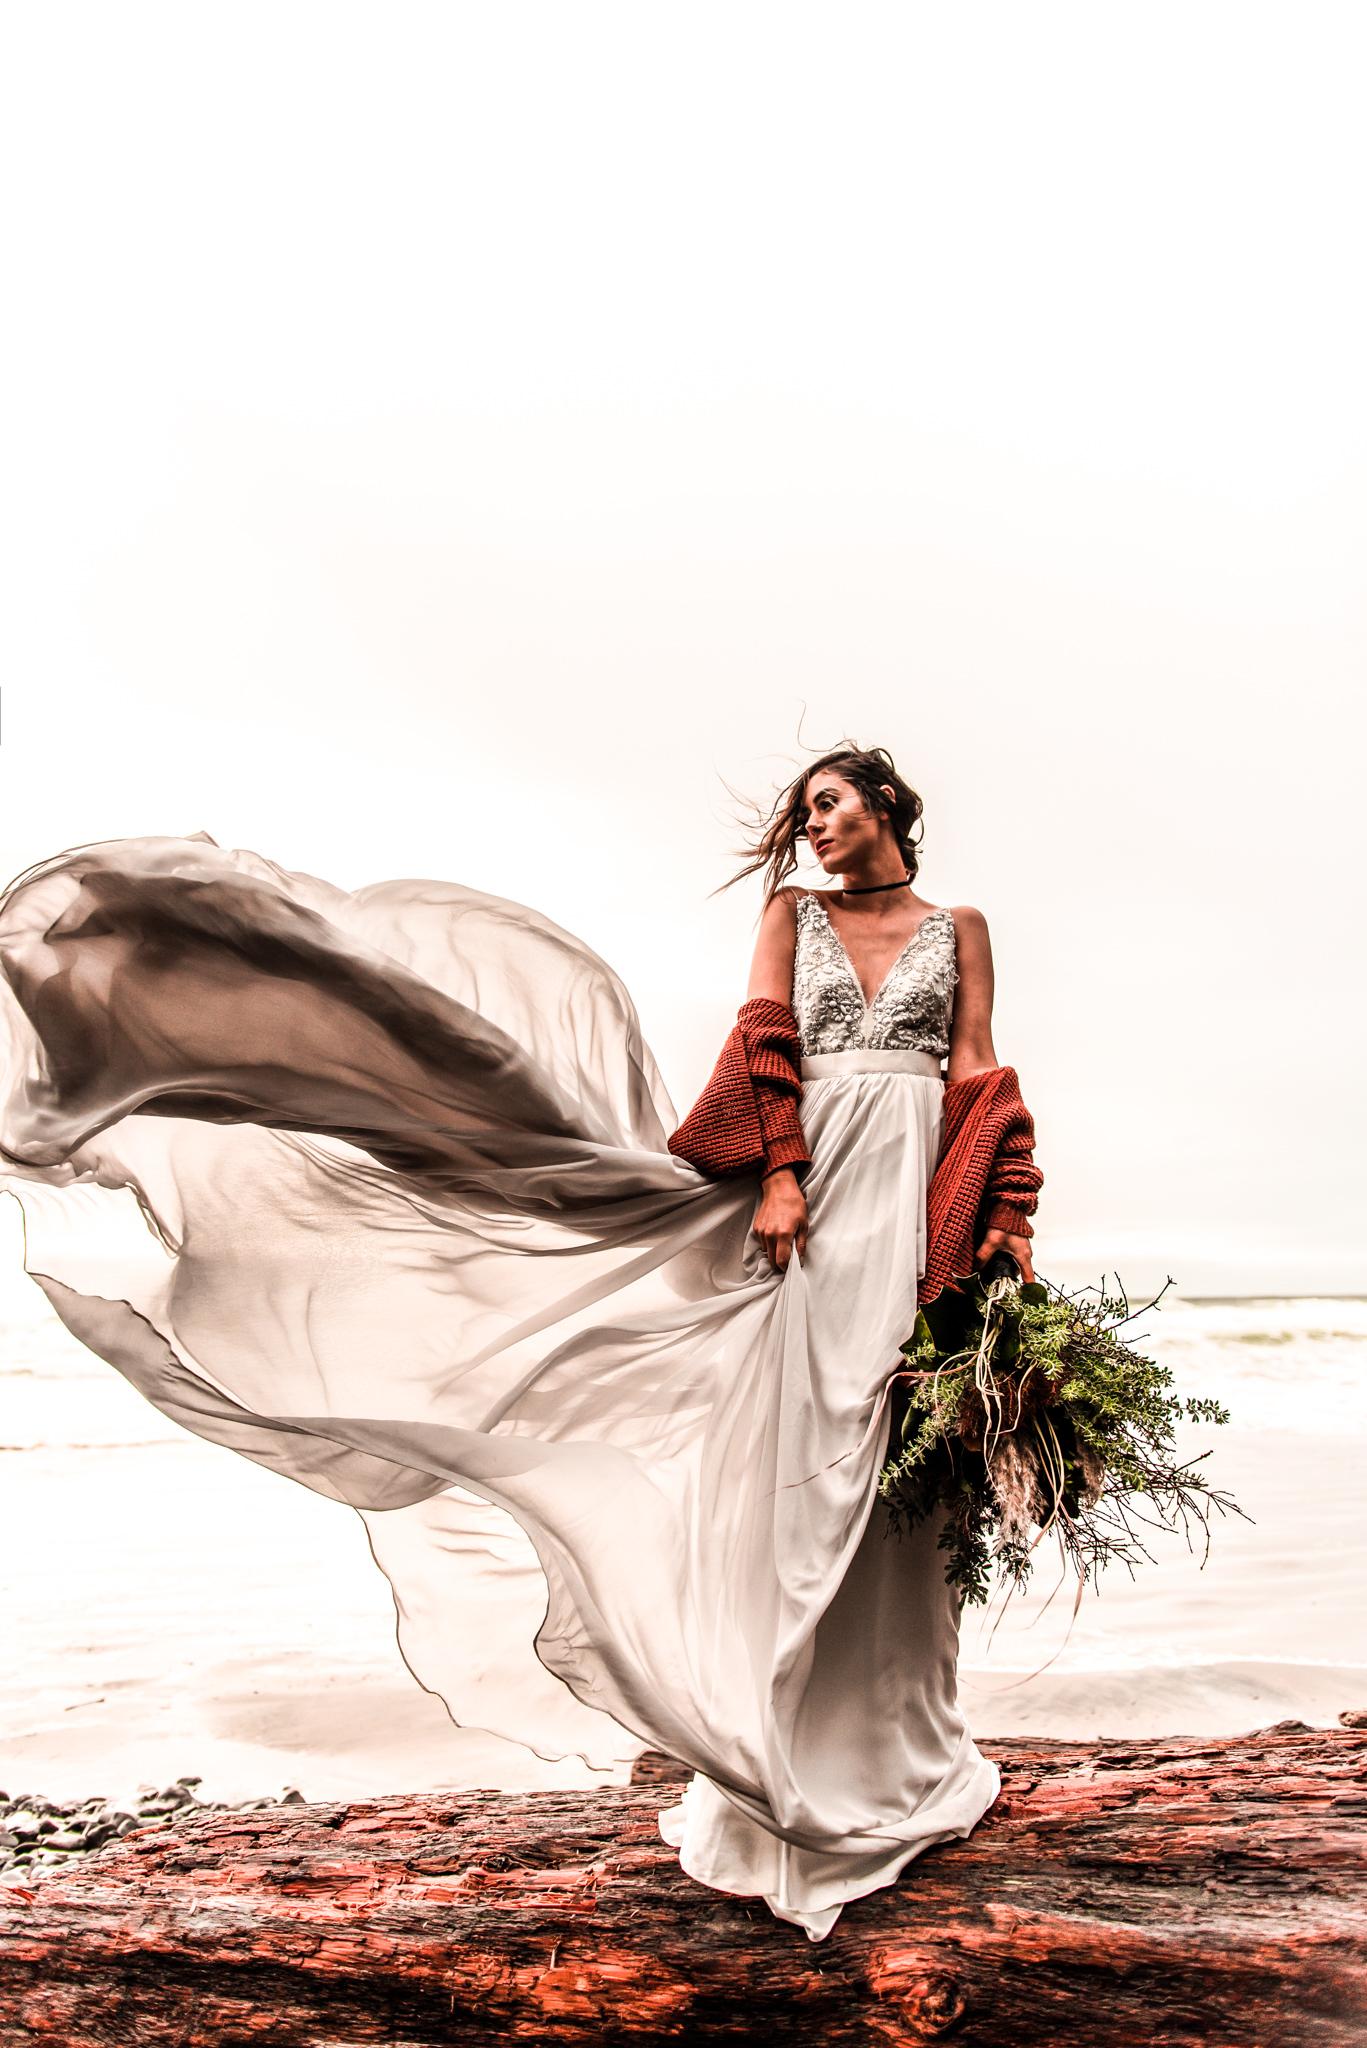 Cannon Beach OR Elopement wedding photograph